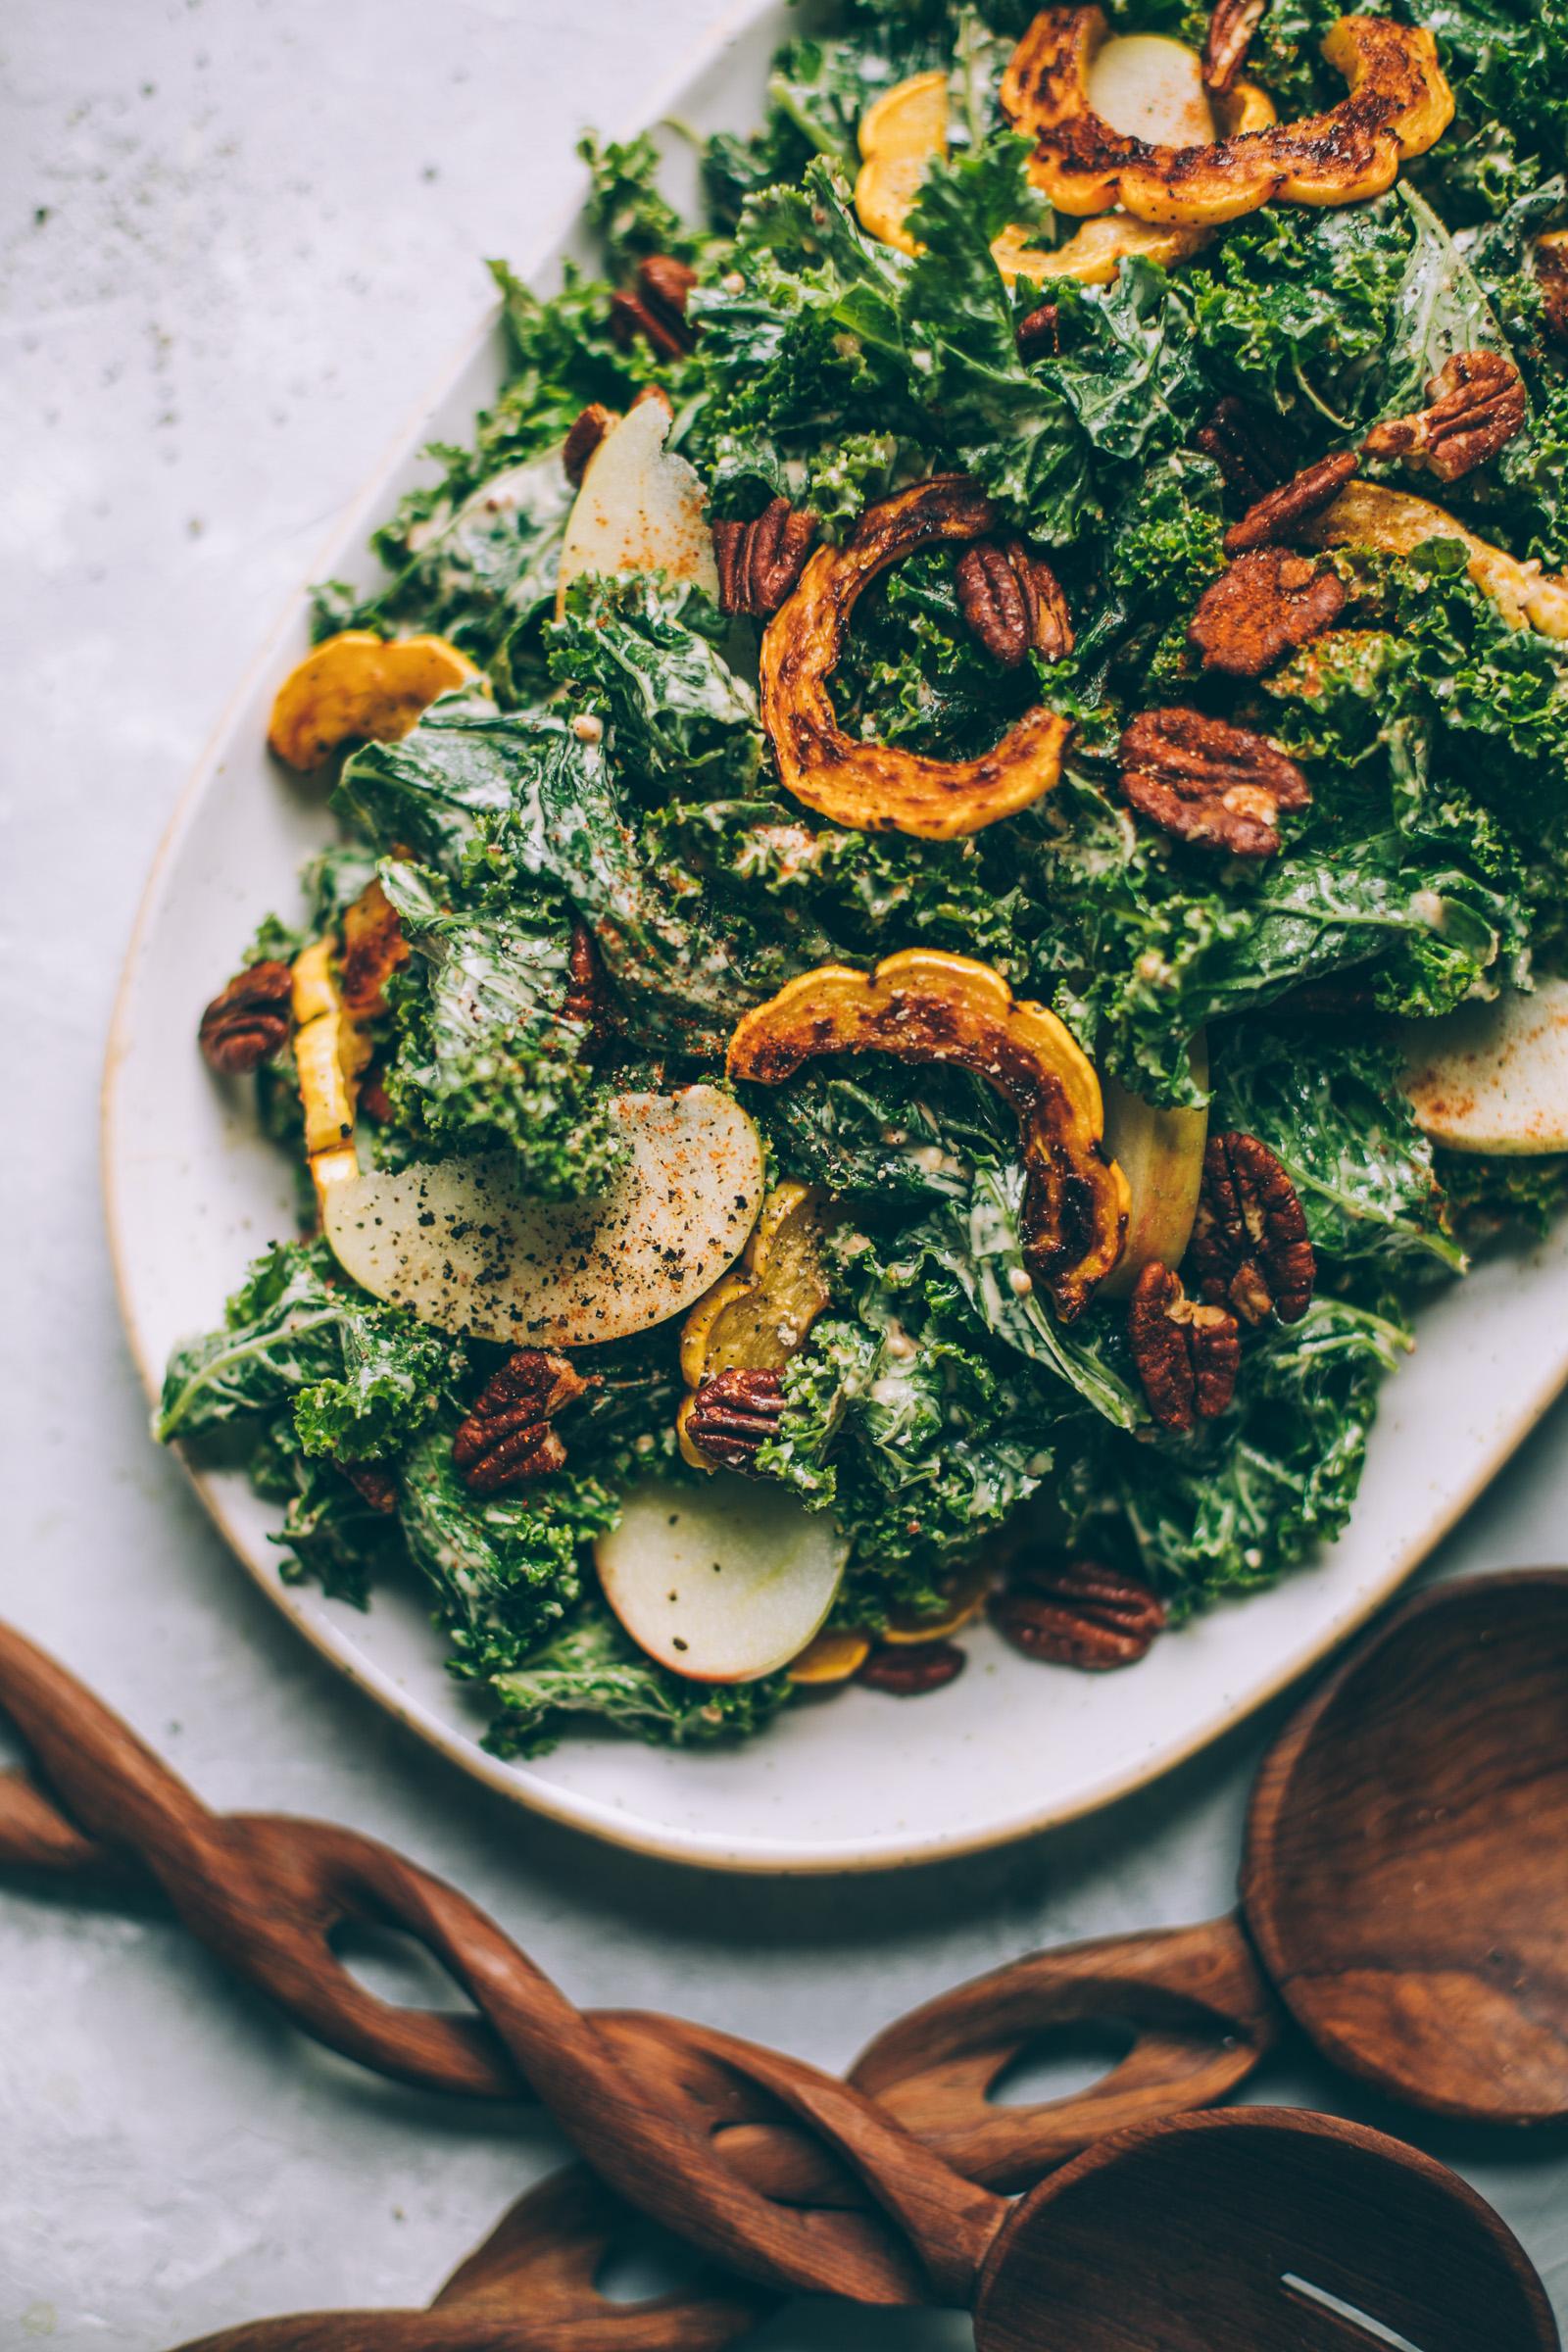 Harvest Moon Kale Caesar Salad Recipe with Cashew Maple Dijon Dressing + roasted delicata squash, apples and tamari pecans